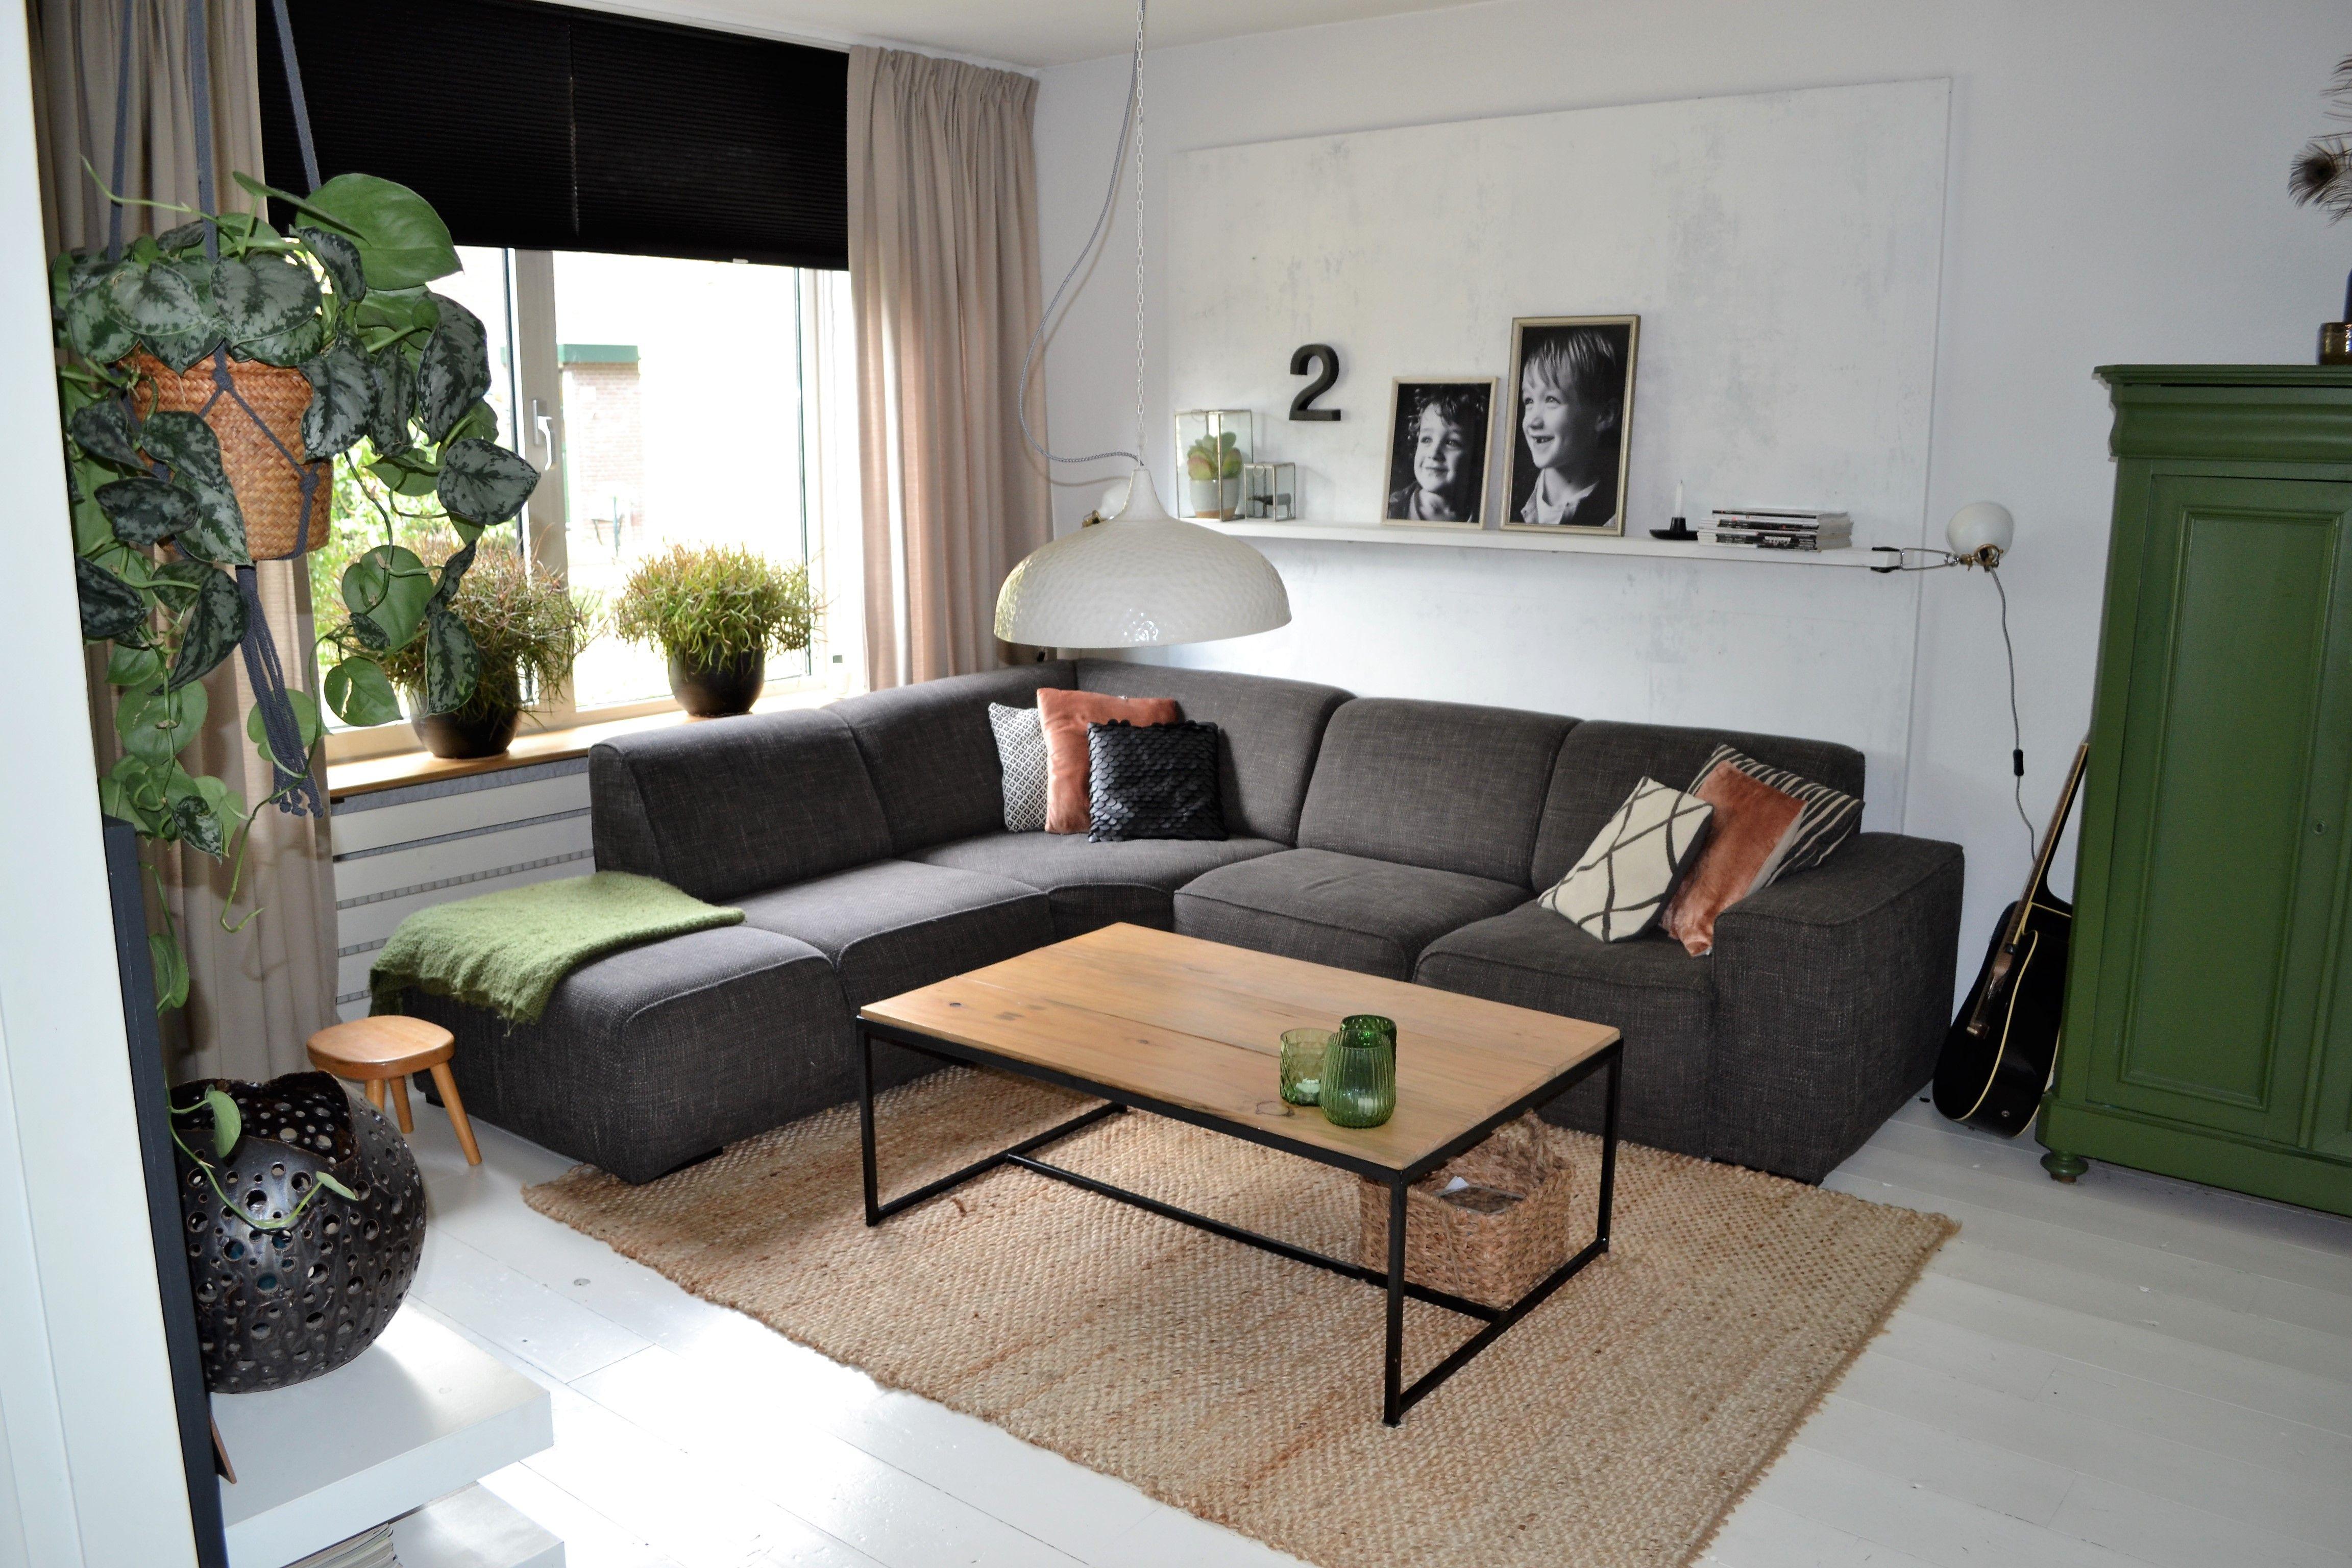 MANON interieur STYLING Woonkamer industrieel met warm groen en ...